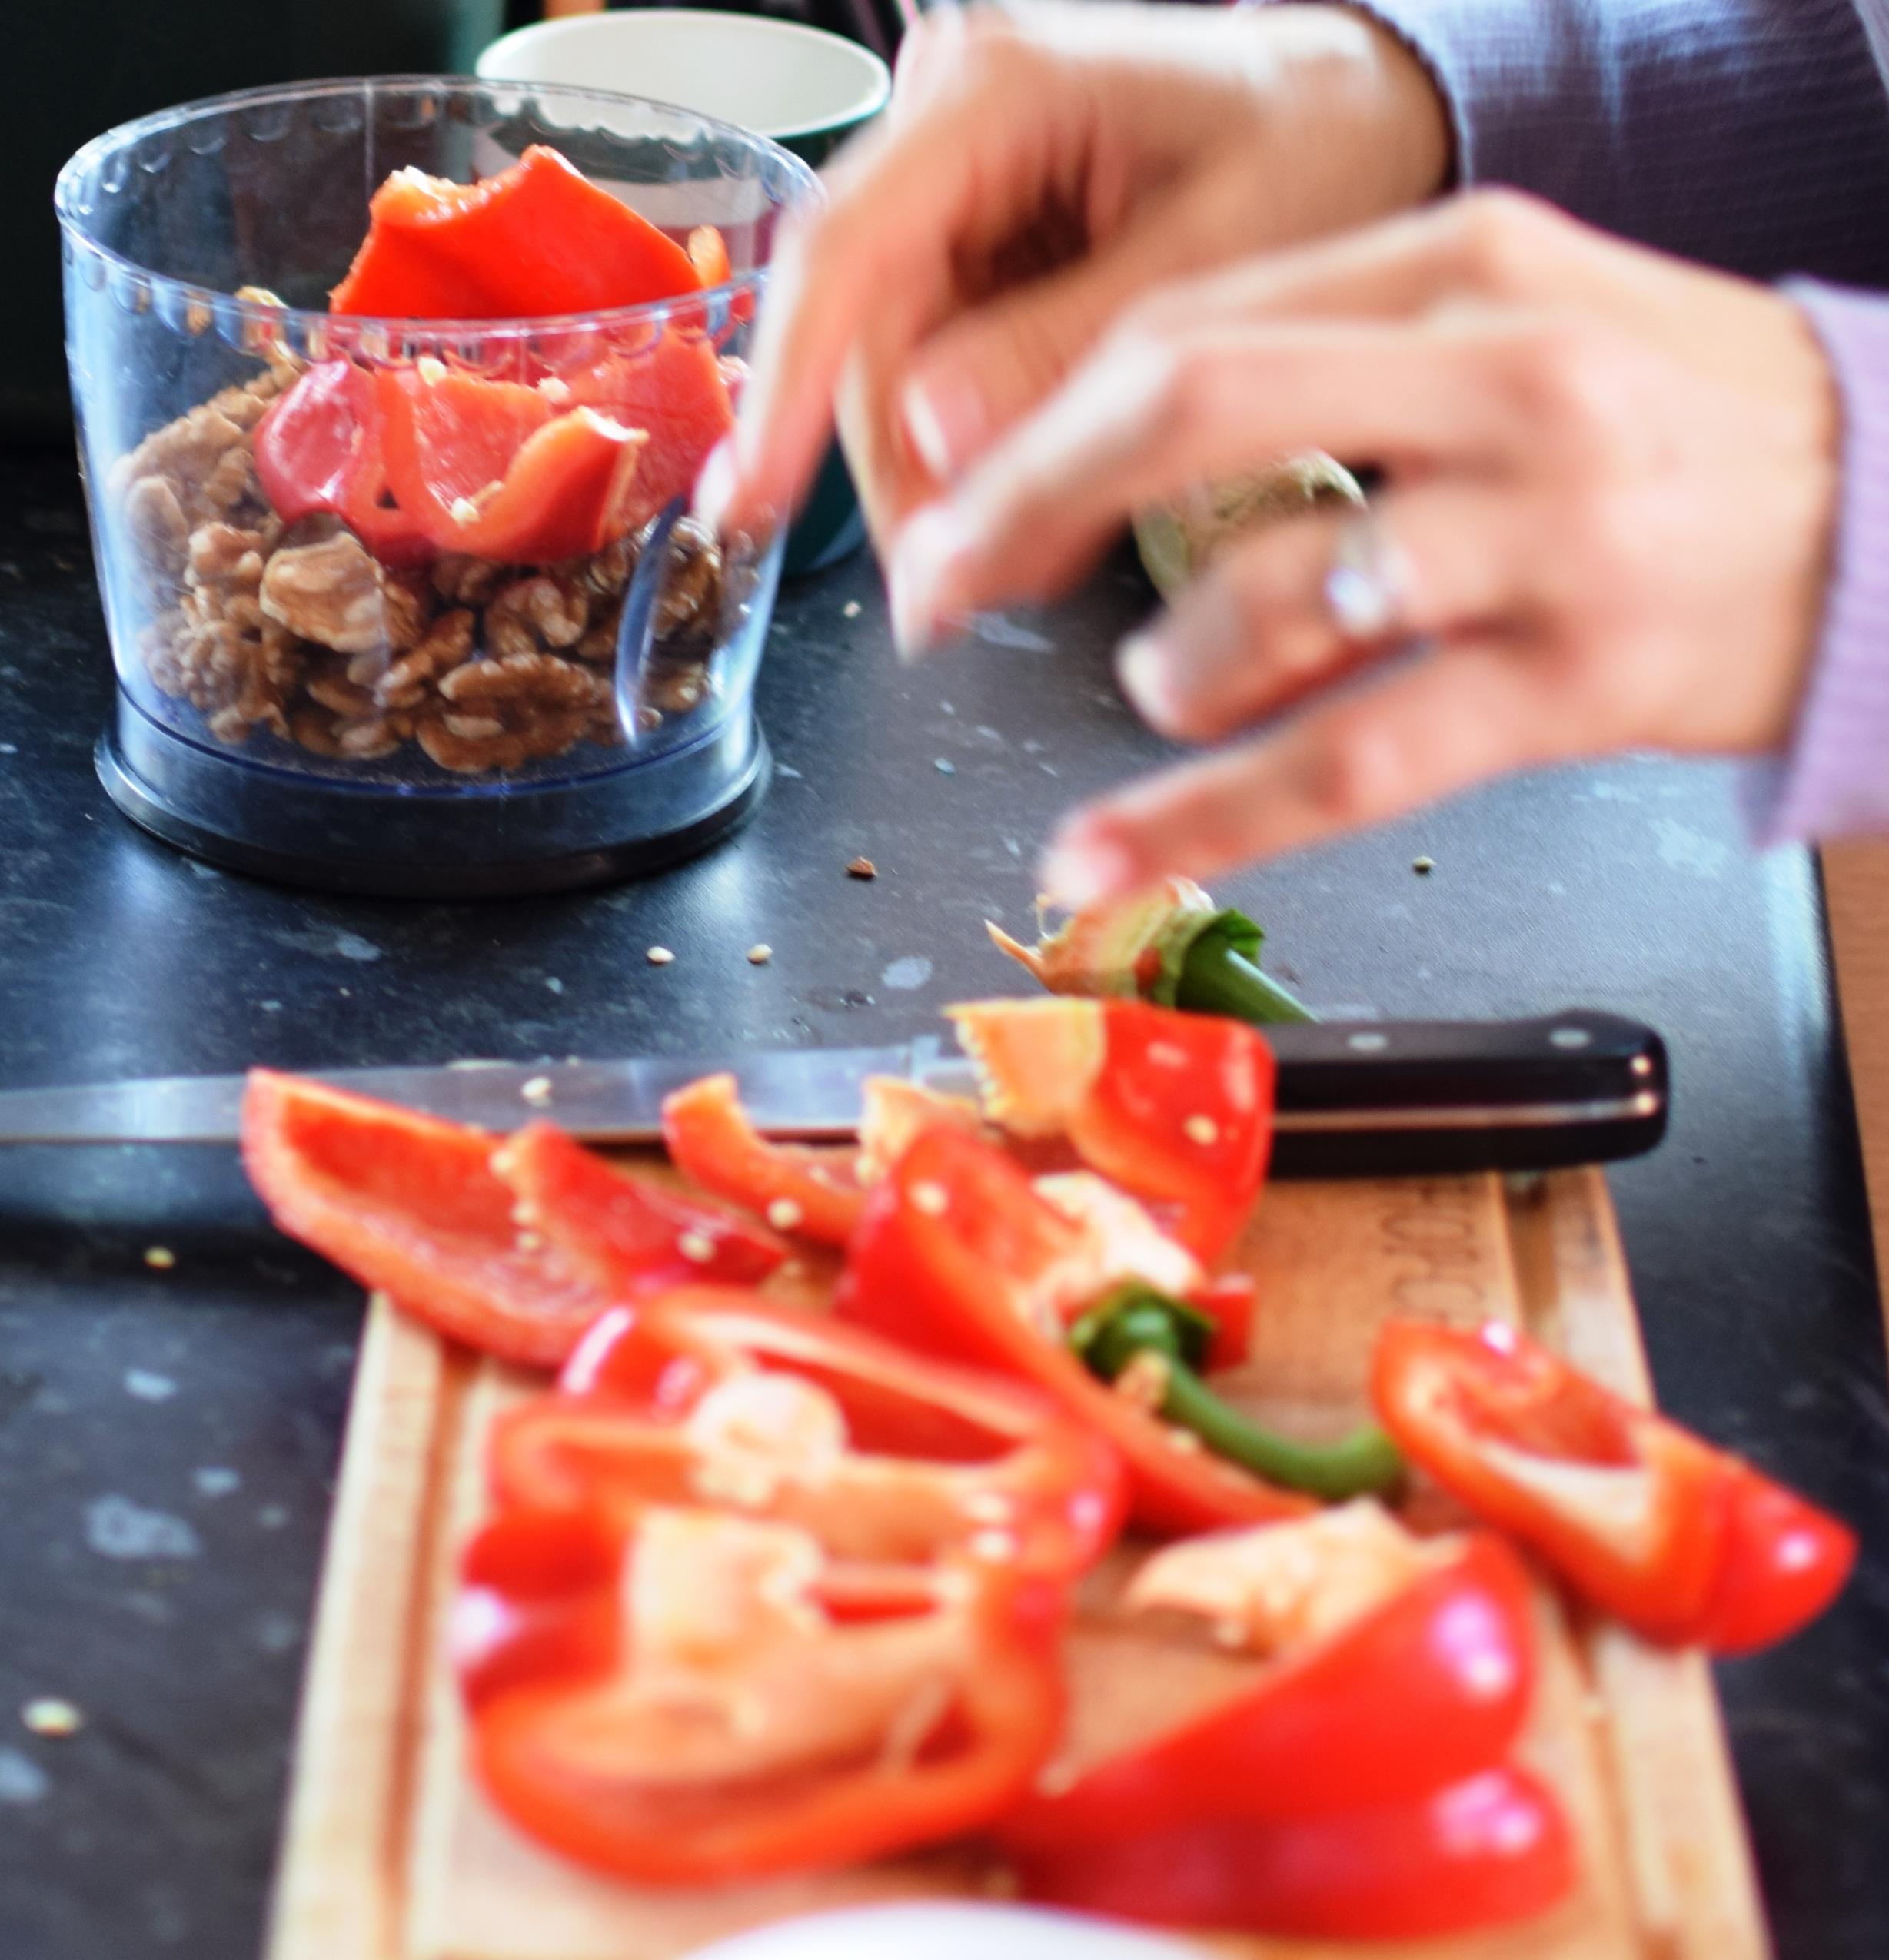 New summer recipe raw red pepper hummus pt gen personal trainer vegan red pepper hummus southampton personal trainer gen preece boot camp forumfinder Images